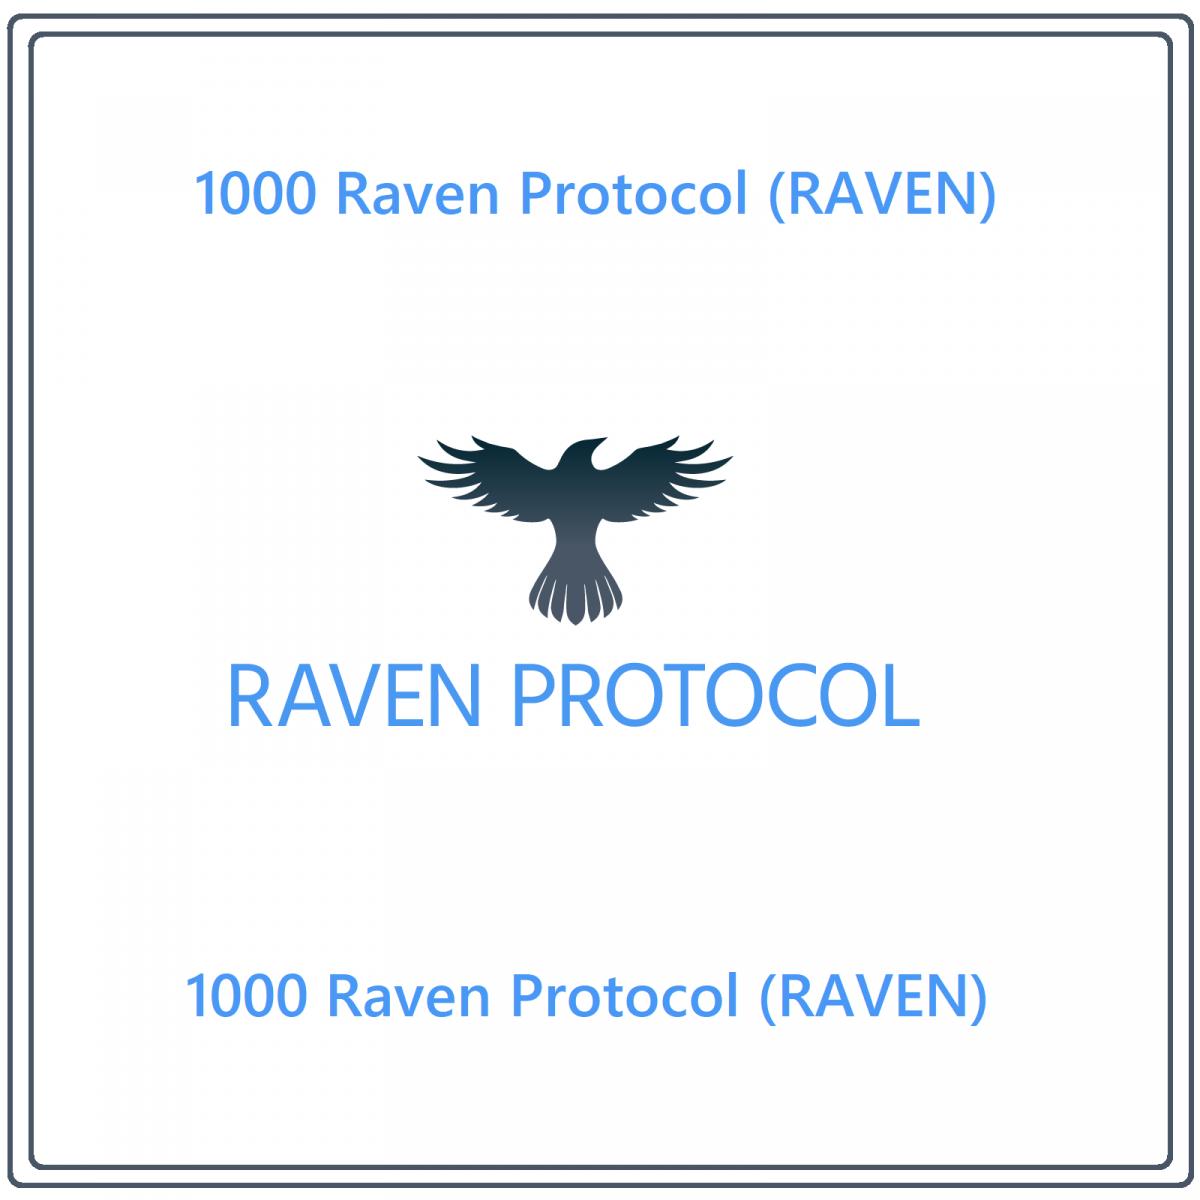 1000 Raven Protocol (RAVEN) Mining Contract